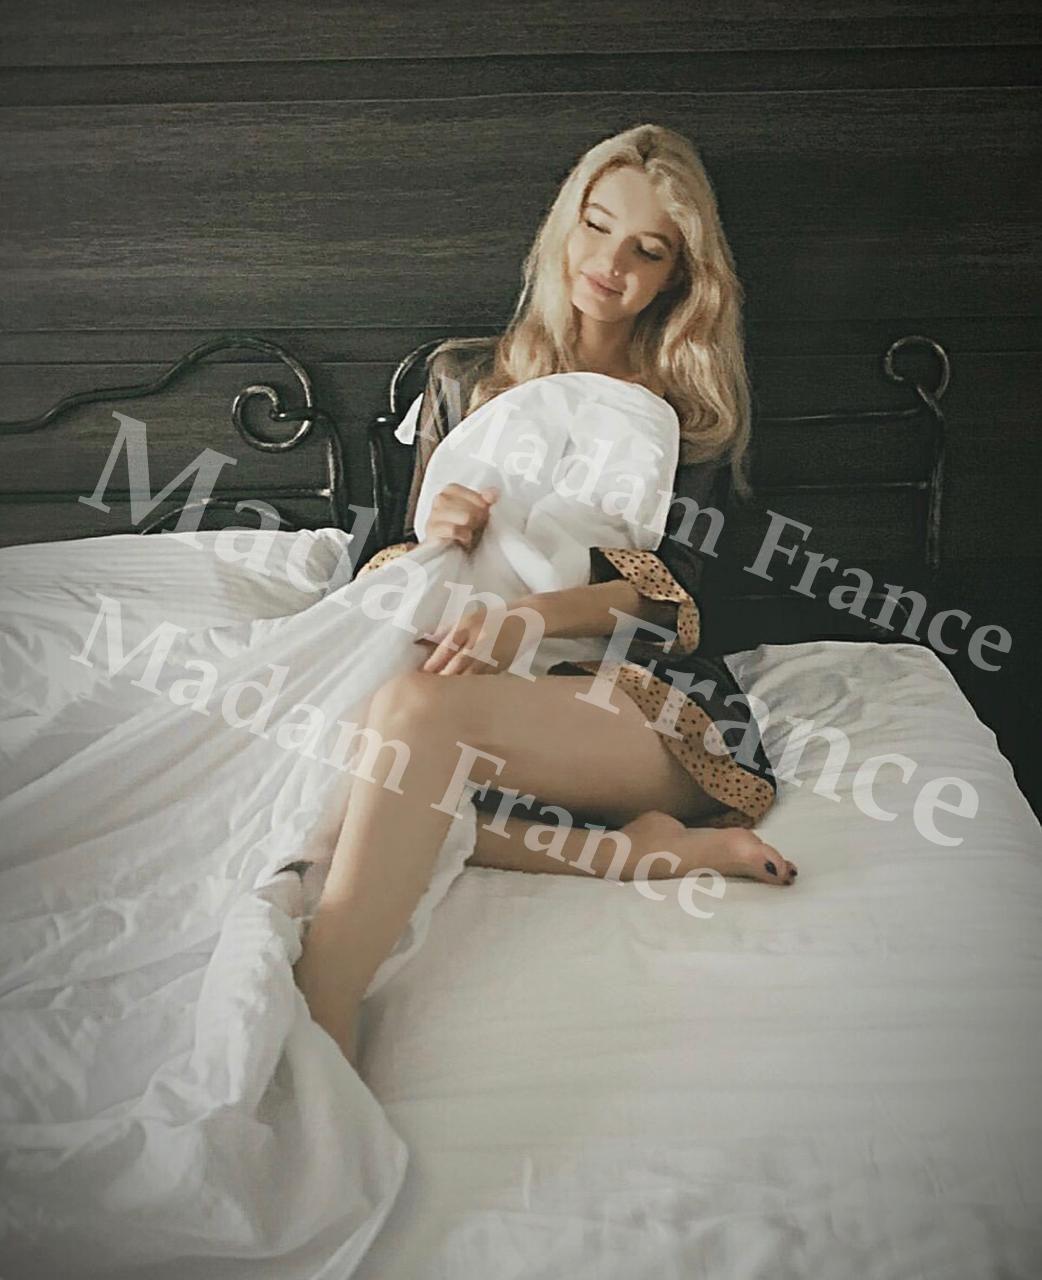 Hana photo on Madam France